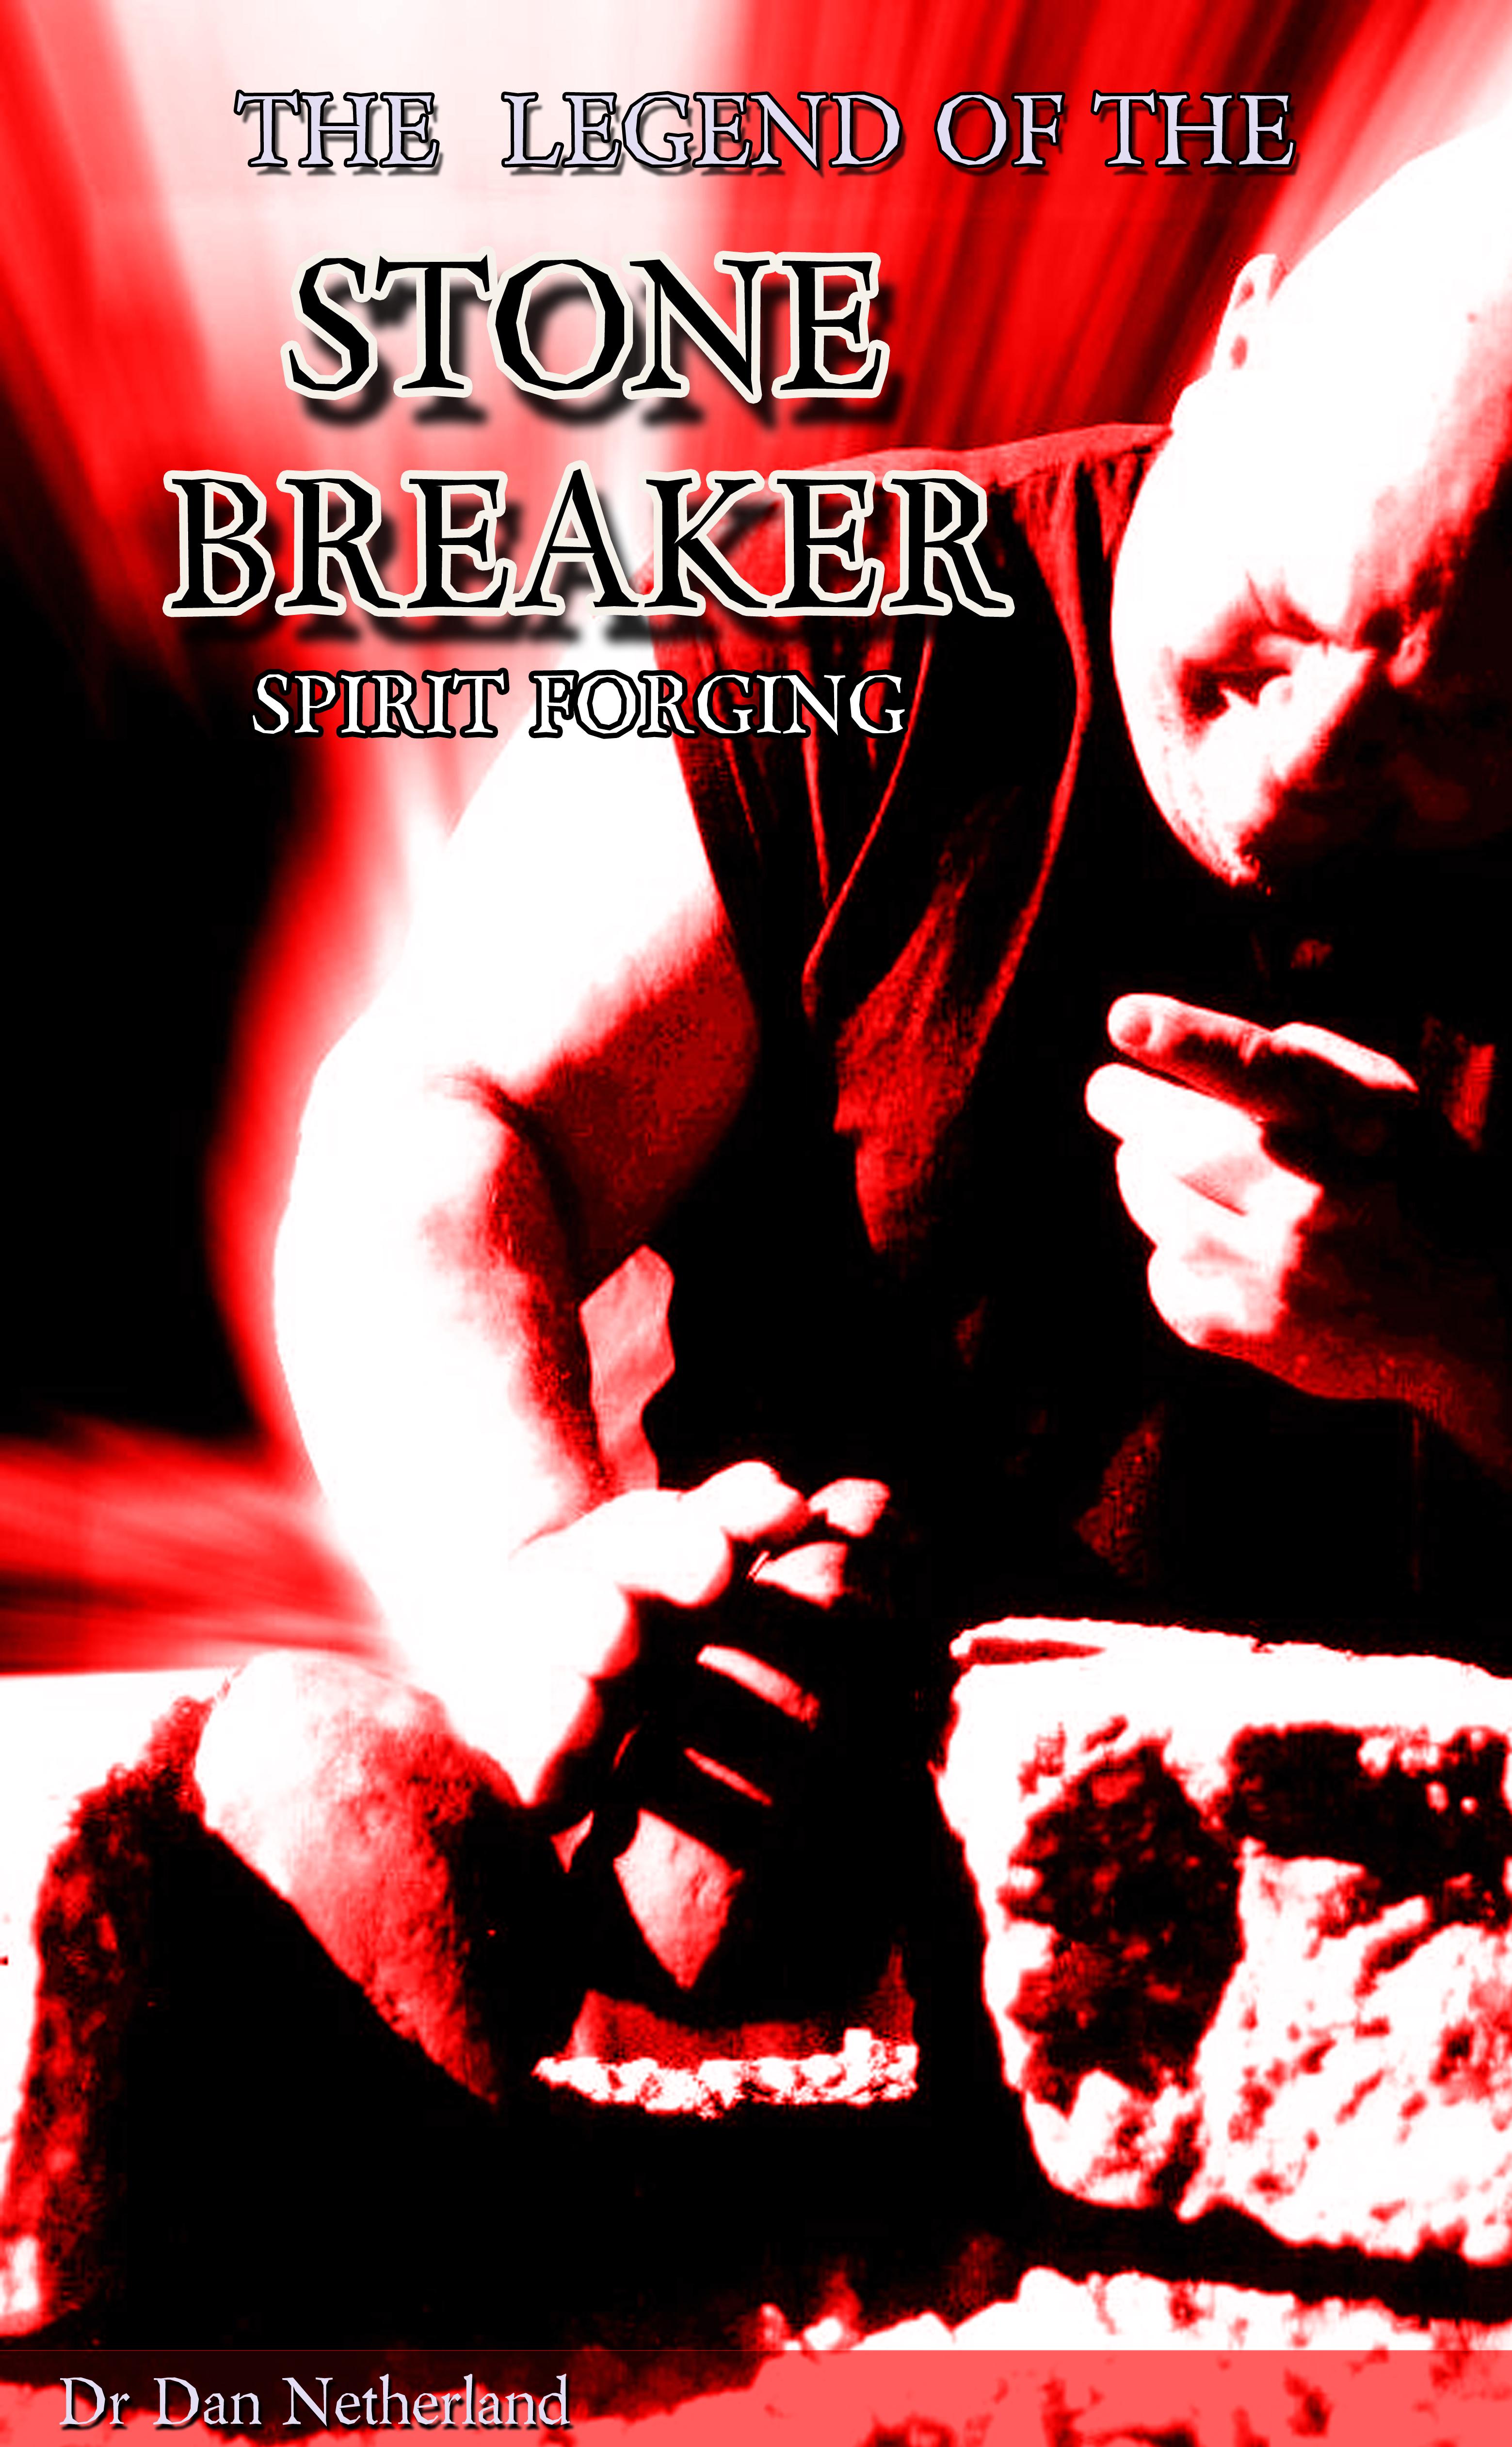 stone breaker1.jpg